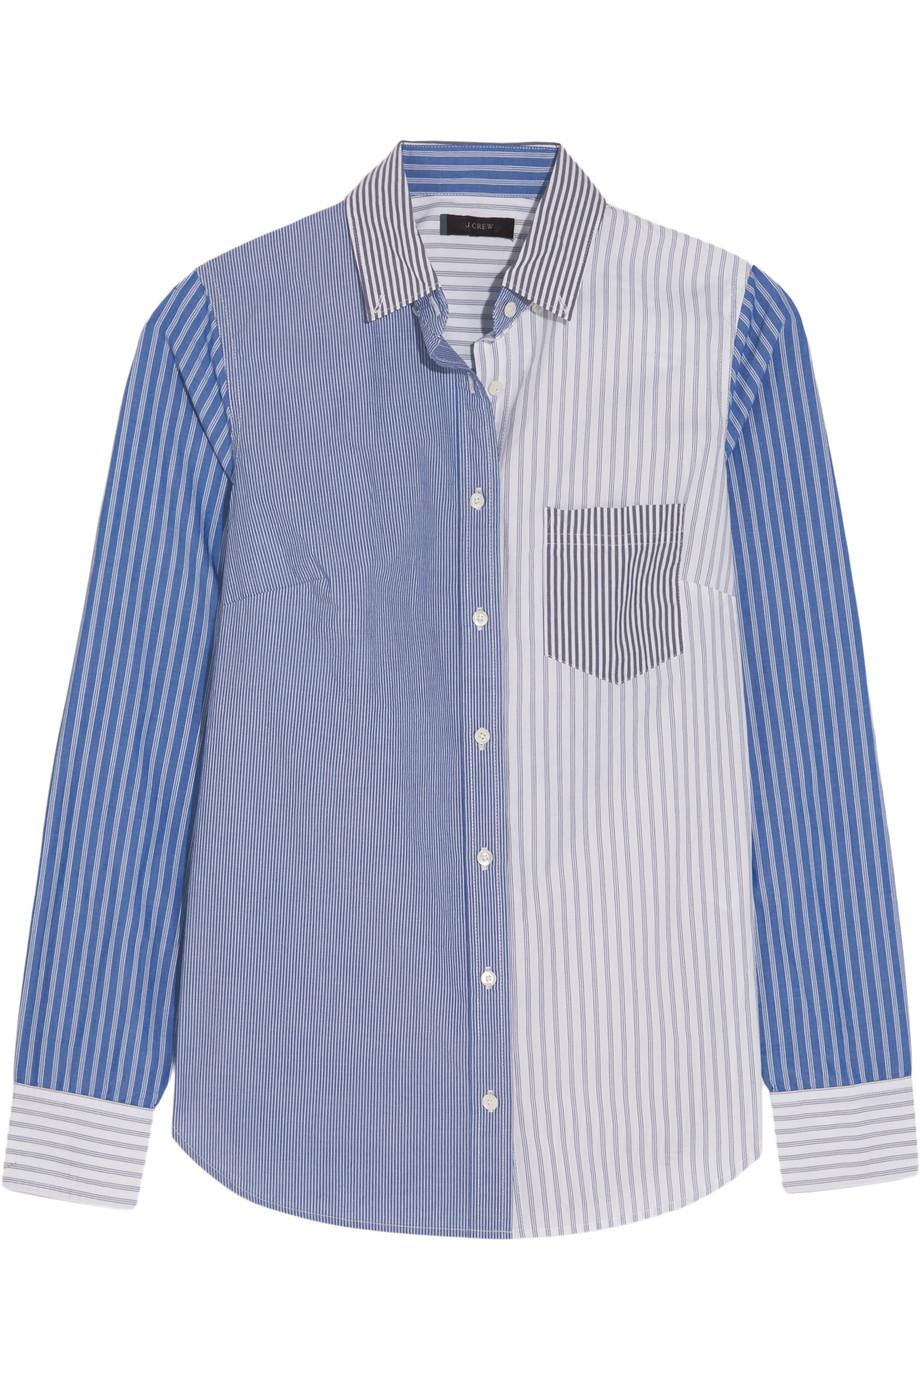 J.Crew Cocktail Striped Cotton-Poplin Shirt, Blue, Women's, Size: 4